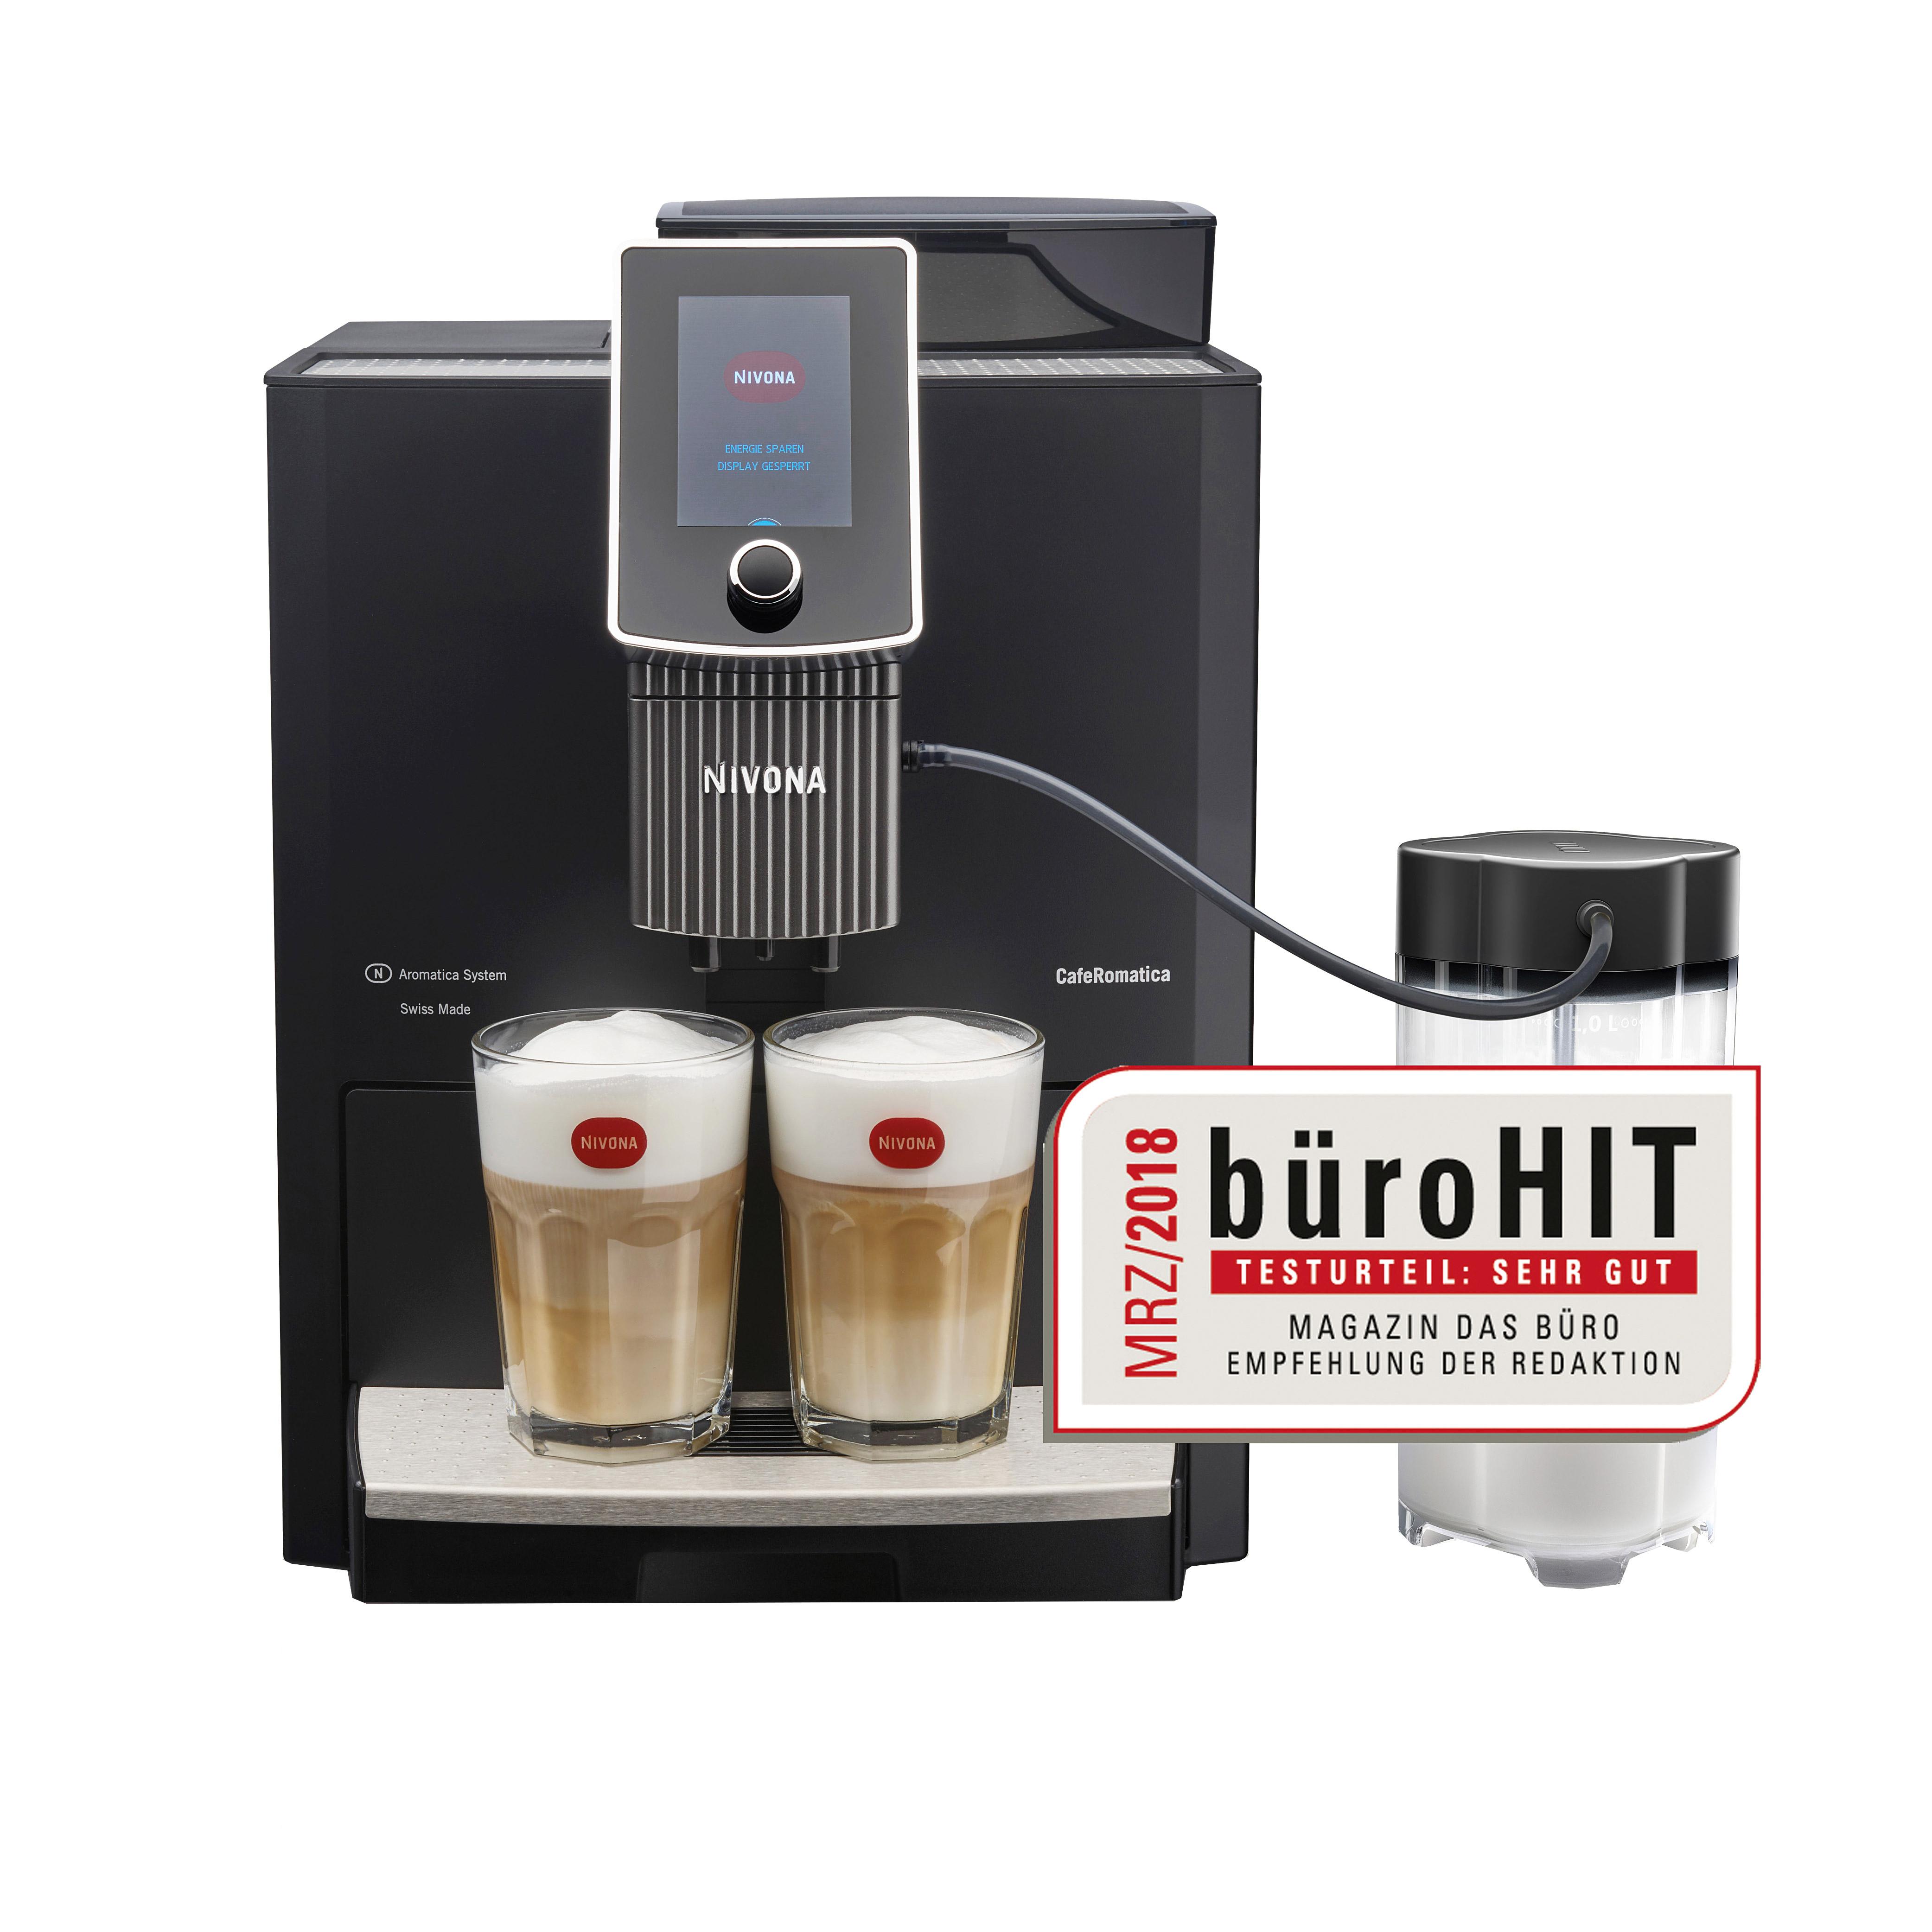 kaffeevollautomat nivona caferomatica 1030 g nstig kaufen. Black Bedroom Furniture Sets. Home Design Ideas